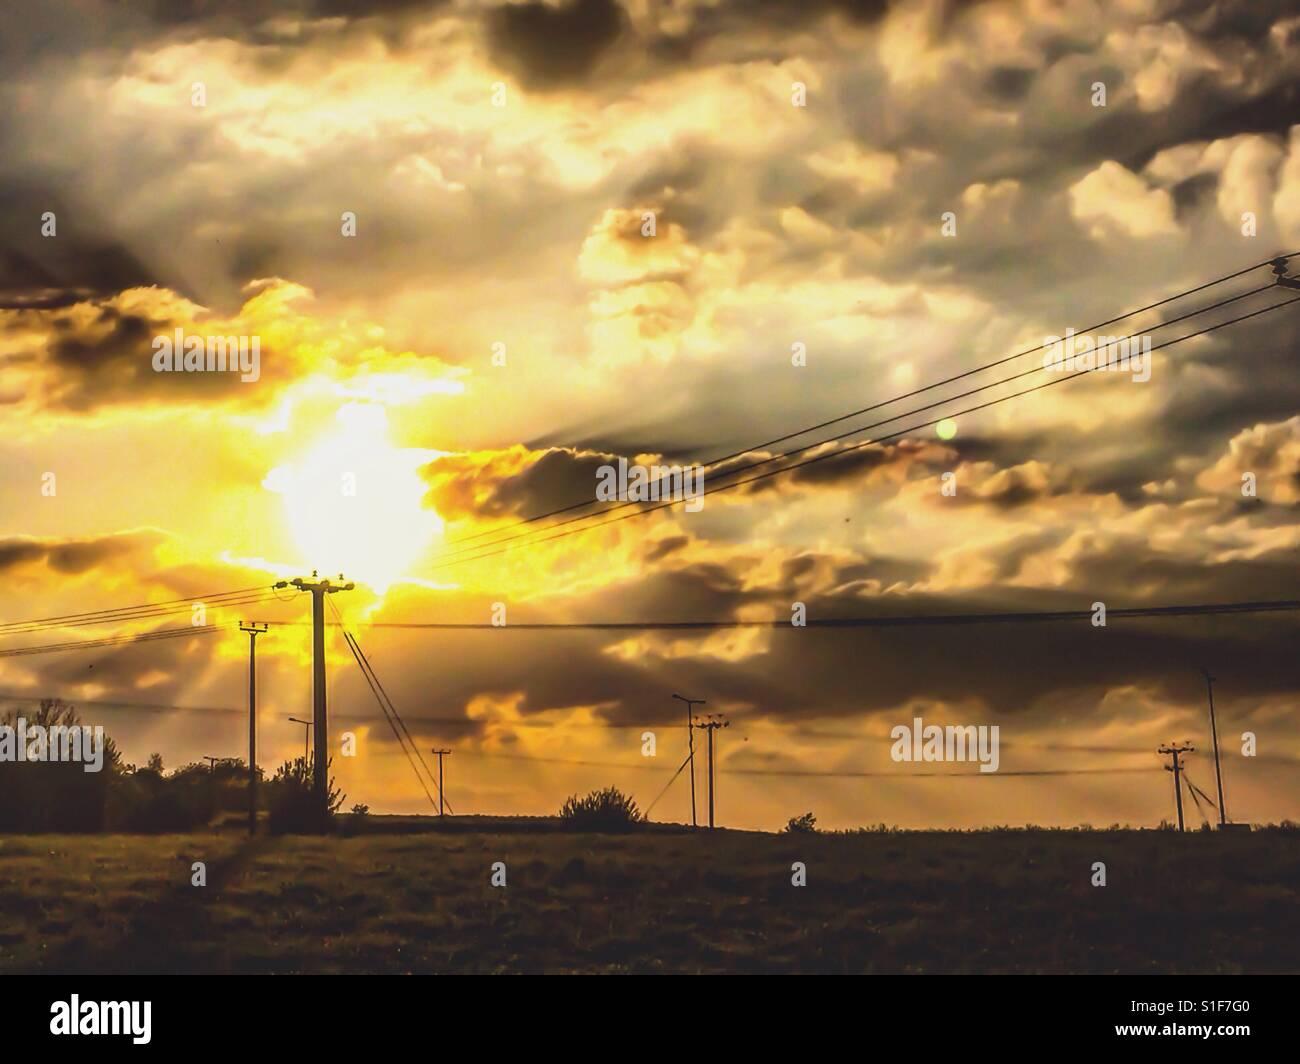 Sun down - Stock Image